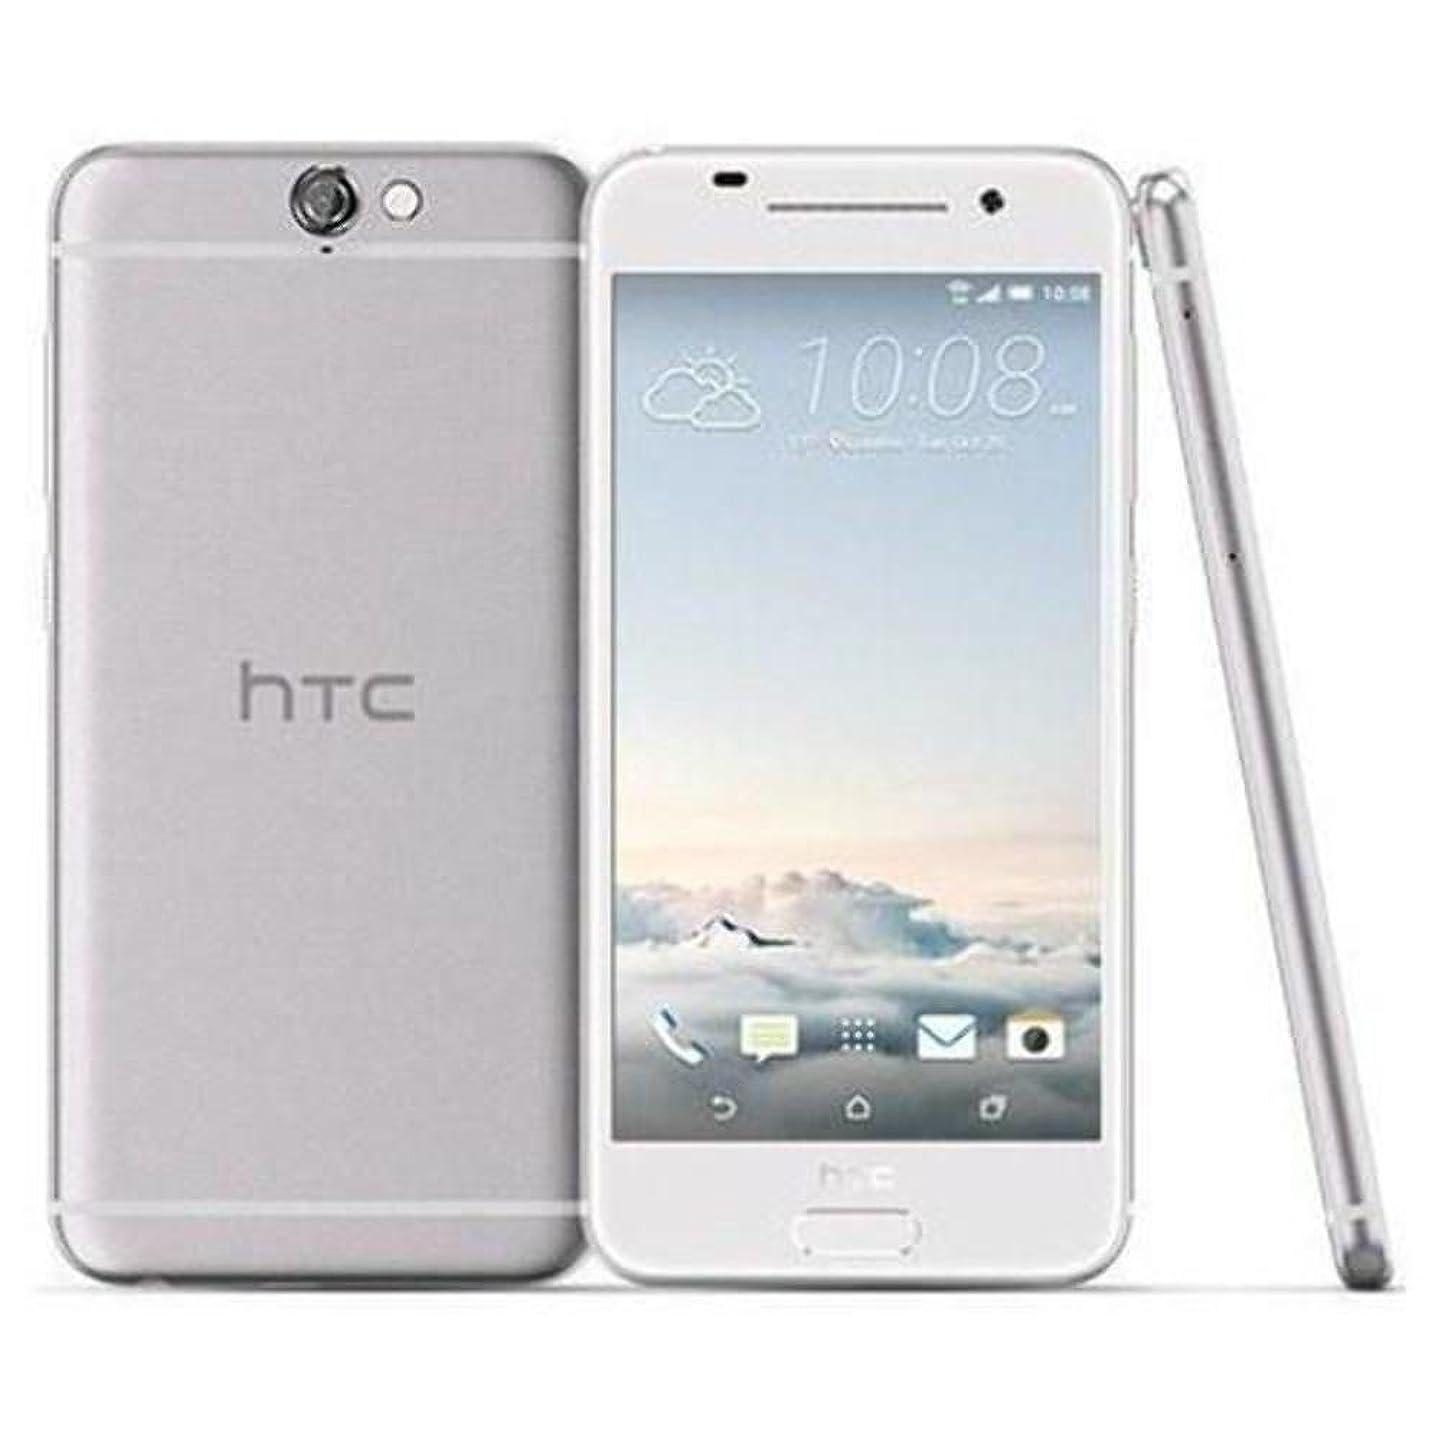 HTC One A9 Factory Unlocked Smartphone, 32GB 4G LTE 5-Inch HD Display (International Stock No Warranty), OPAL SILVER